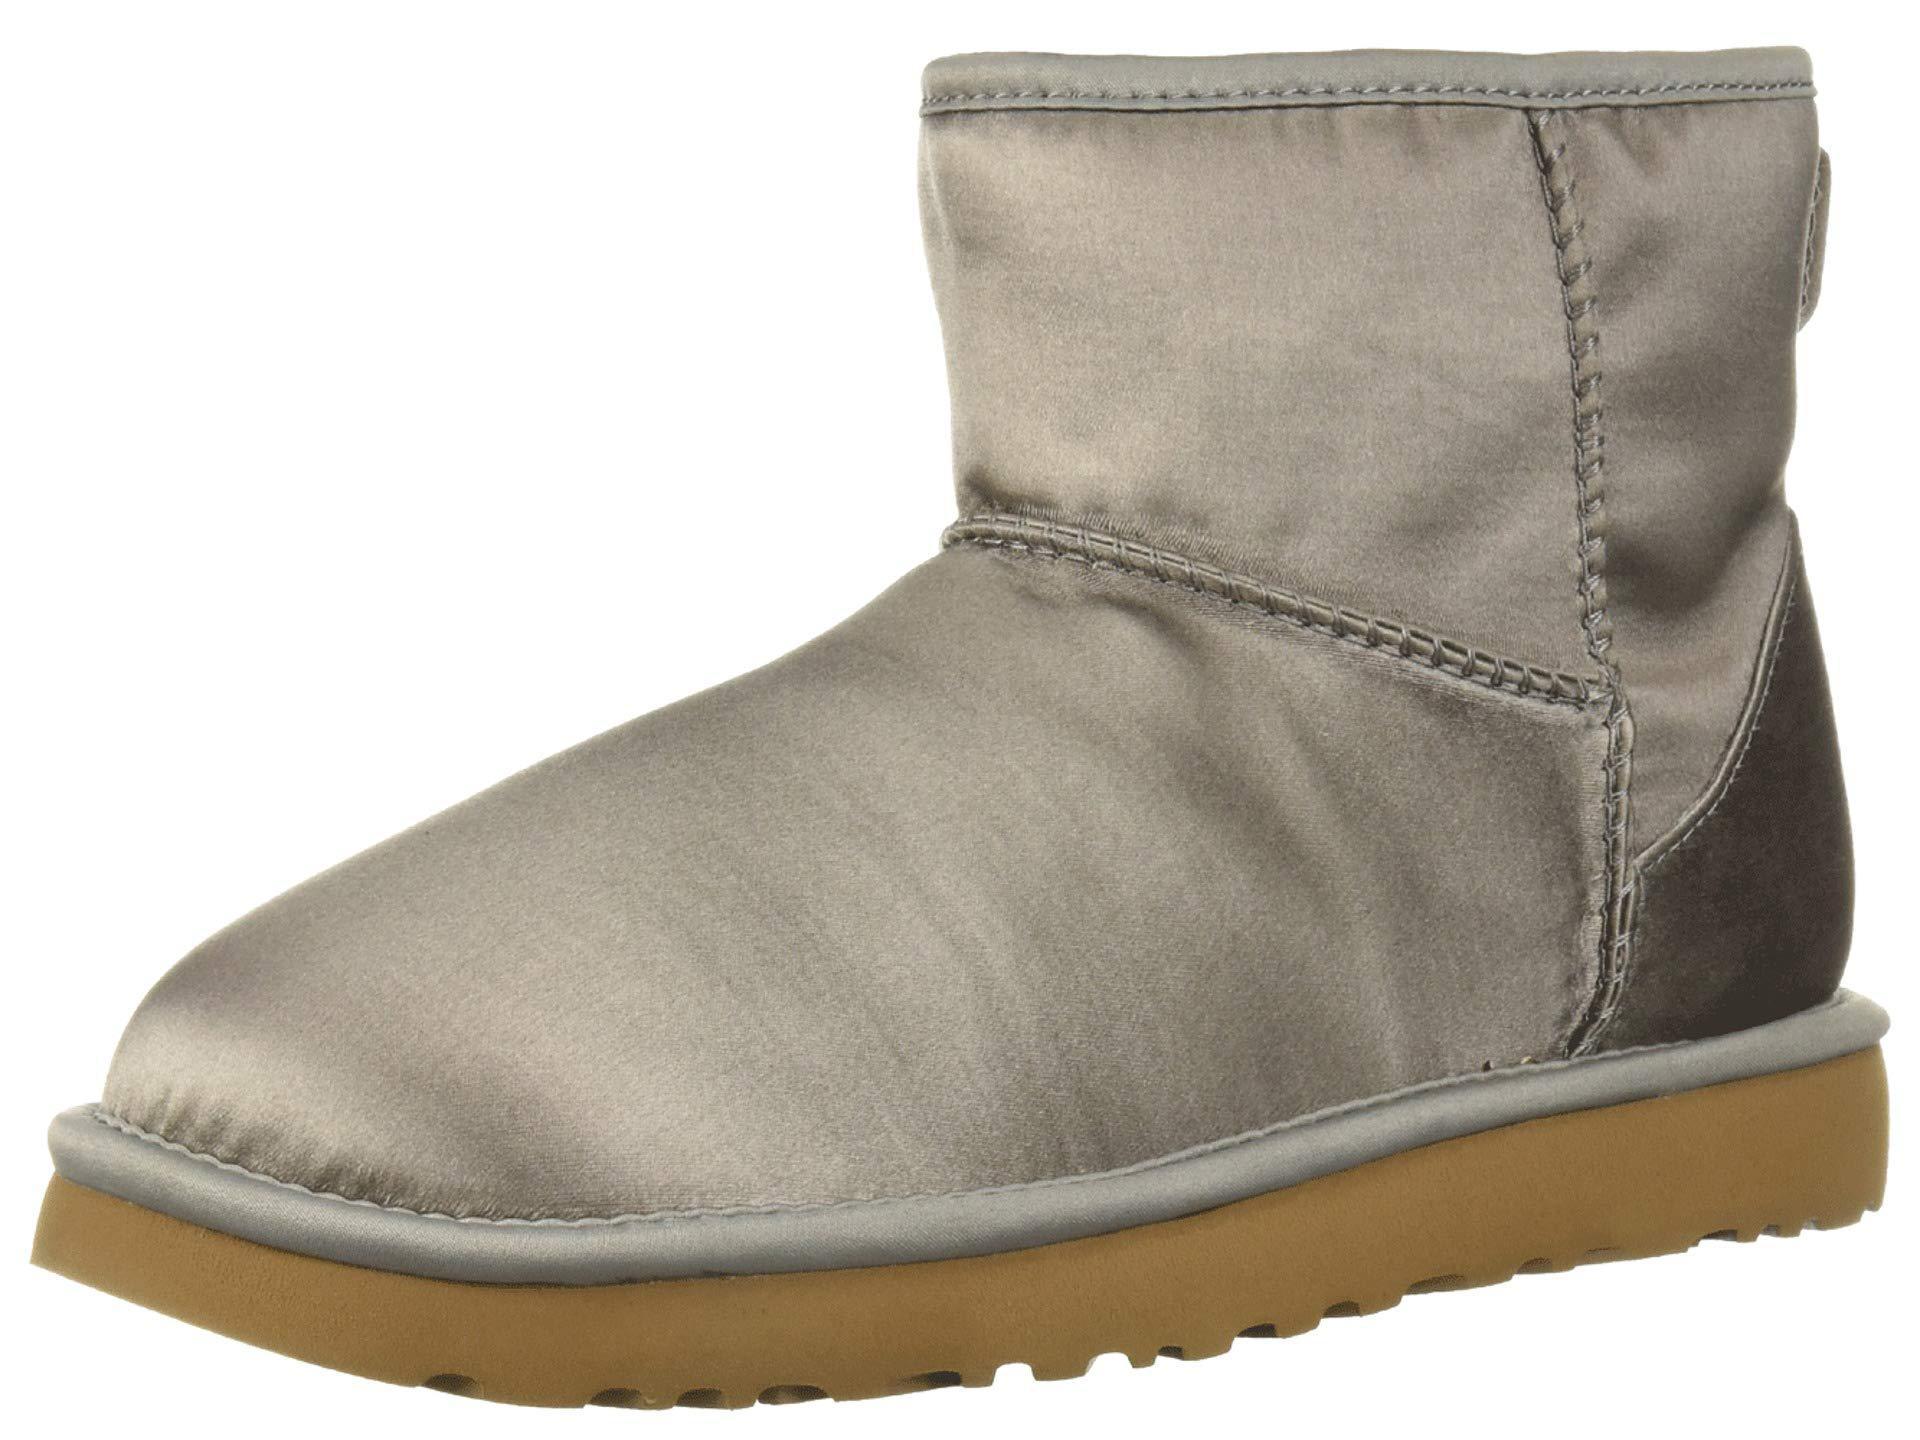 61541ac3284e Lyst - UGG Classic Mini Satin (elephant) Women s Pull-on Boots